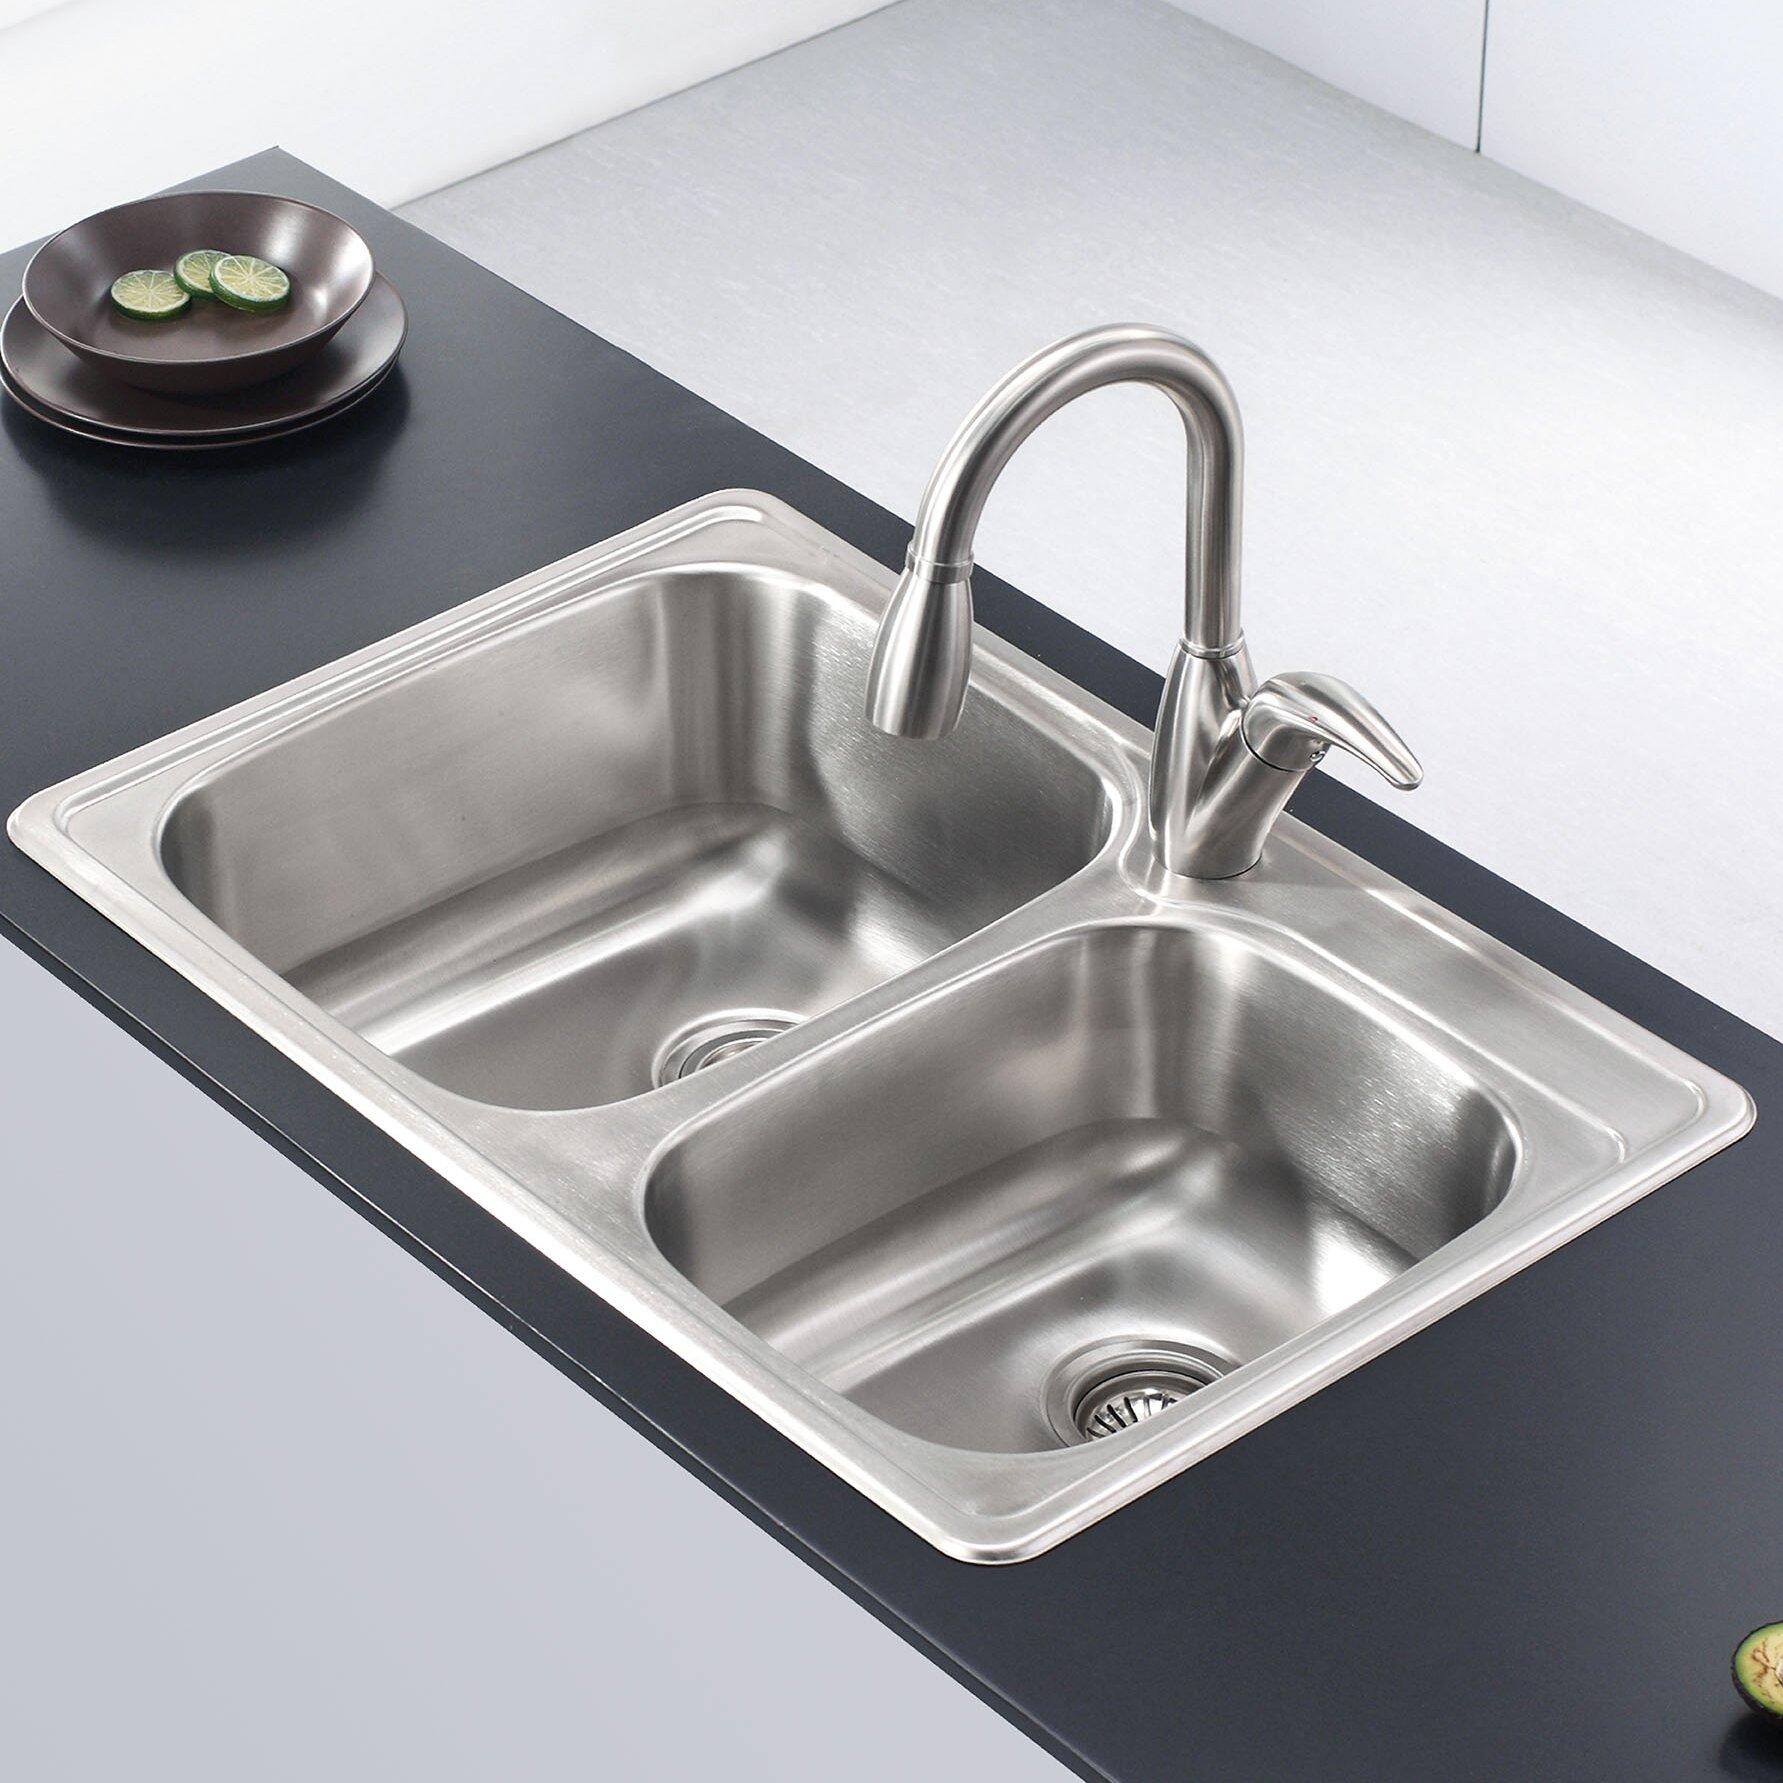 stainless steel 33 x 22 double basin drop in kitchen sink - Kitchen Sink Drop In